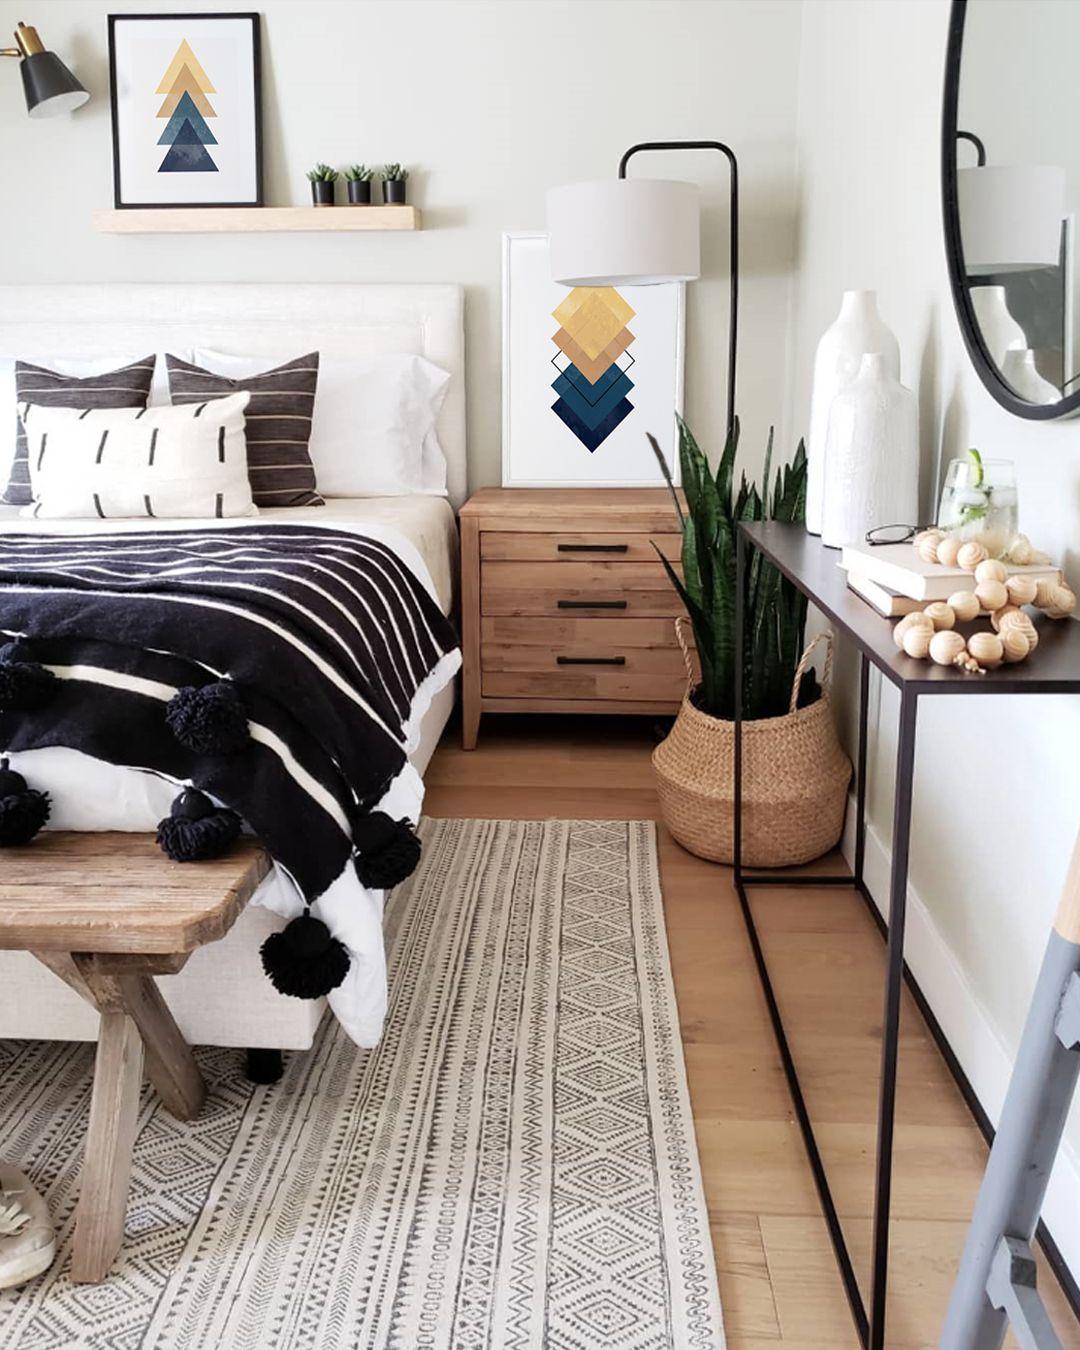 Blue&Yellow Geometric Art Print, Geometry Art, Minimalism , Abstract Poster, Set of Three Prints, Set 3 Prints, Bedroom Wall Art, Above Bed